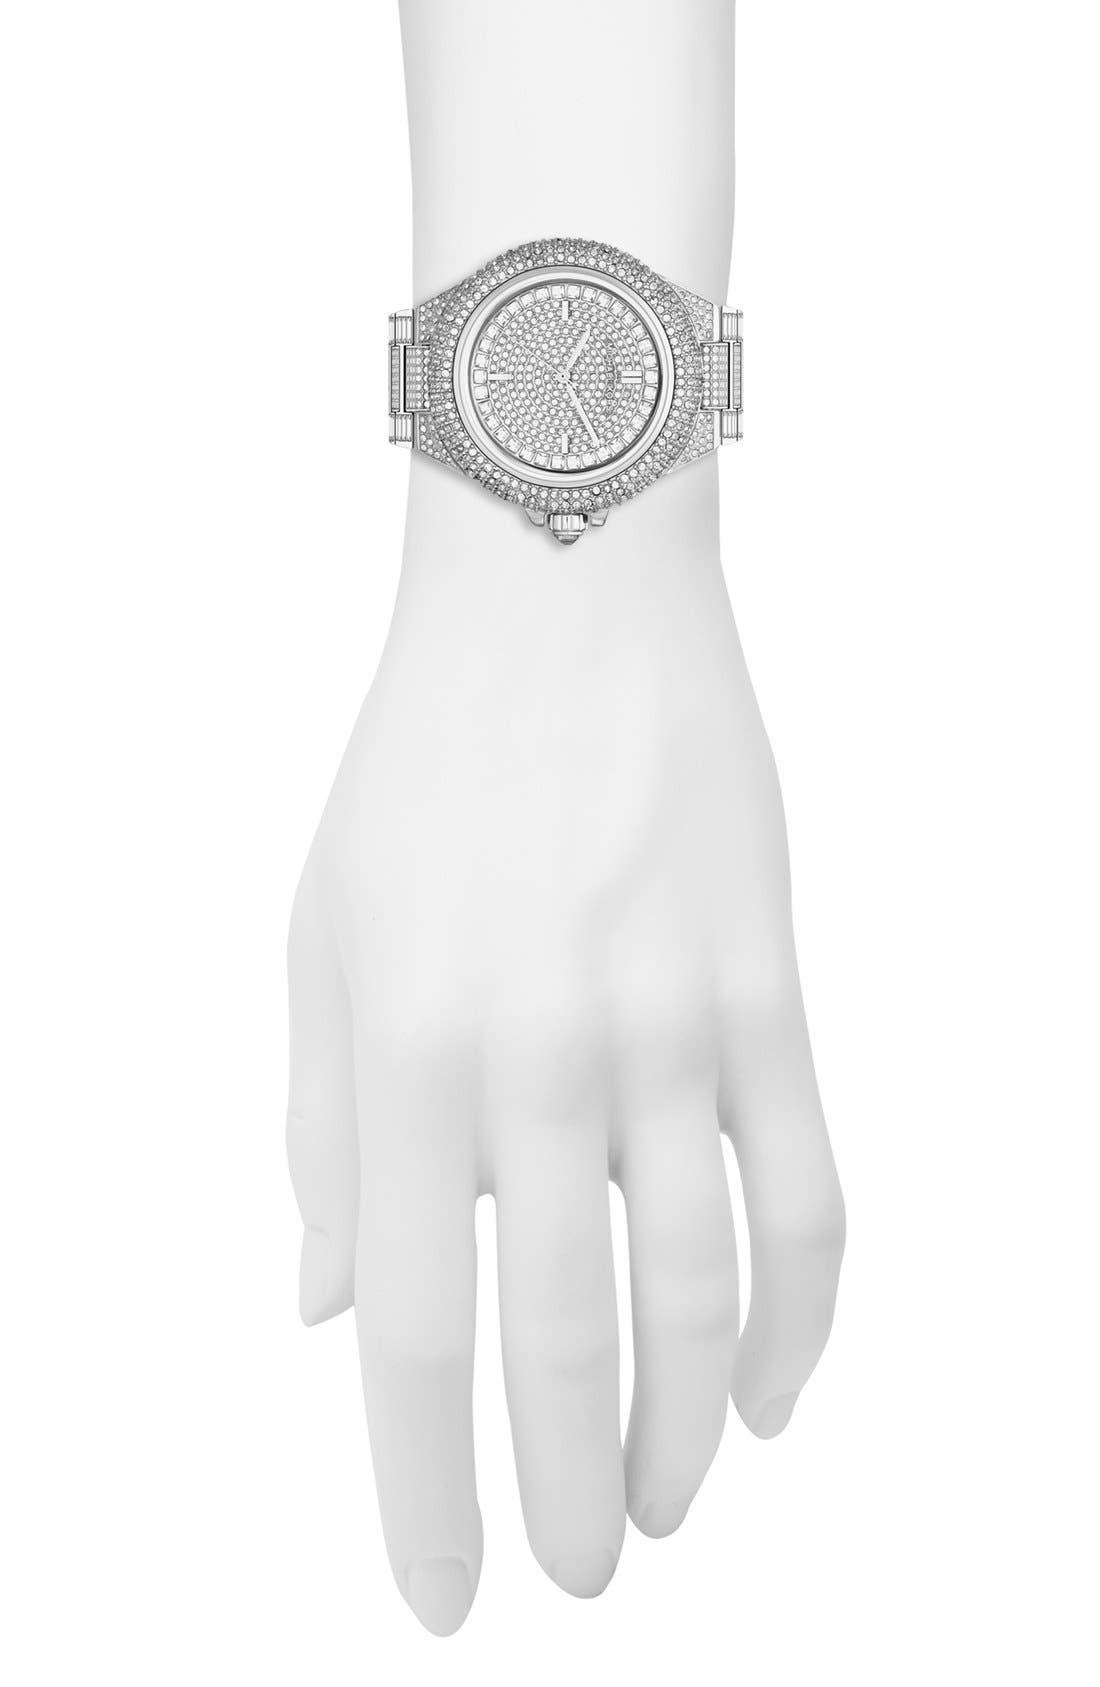 Alternate Image 3  - Michael Kors 'Camille' Crystal Encrusted Bracelet Watch, 44mm